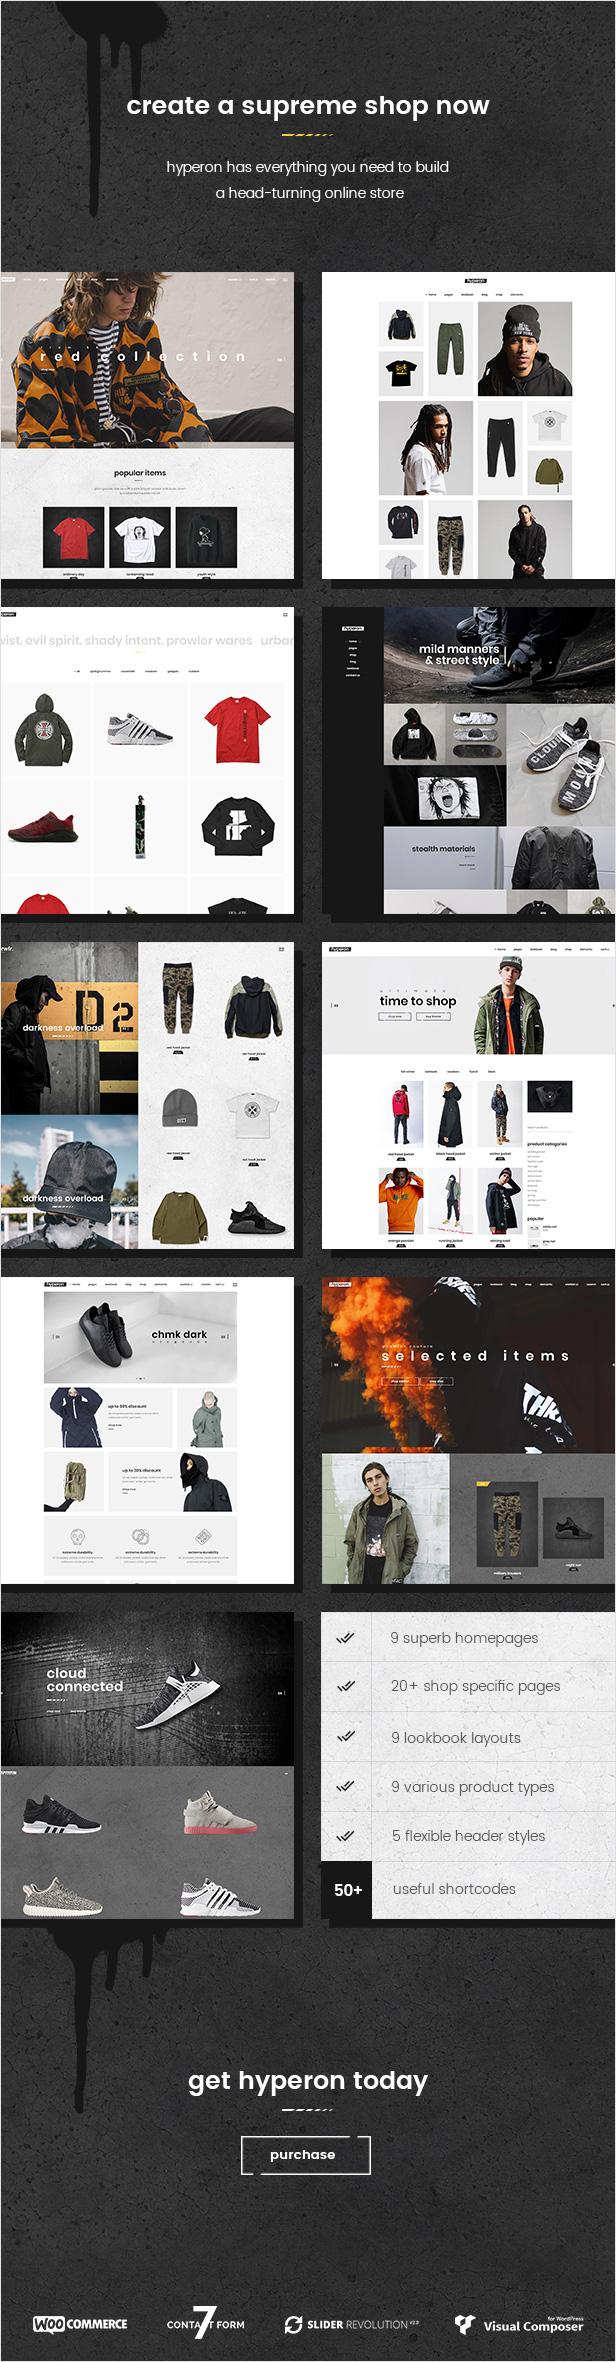 WordPress theme Hyperon - A Streetwear WooCommerce Theme (WooCommerce)